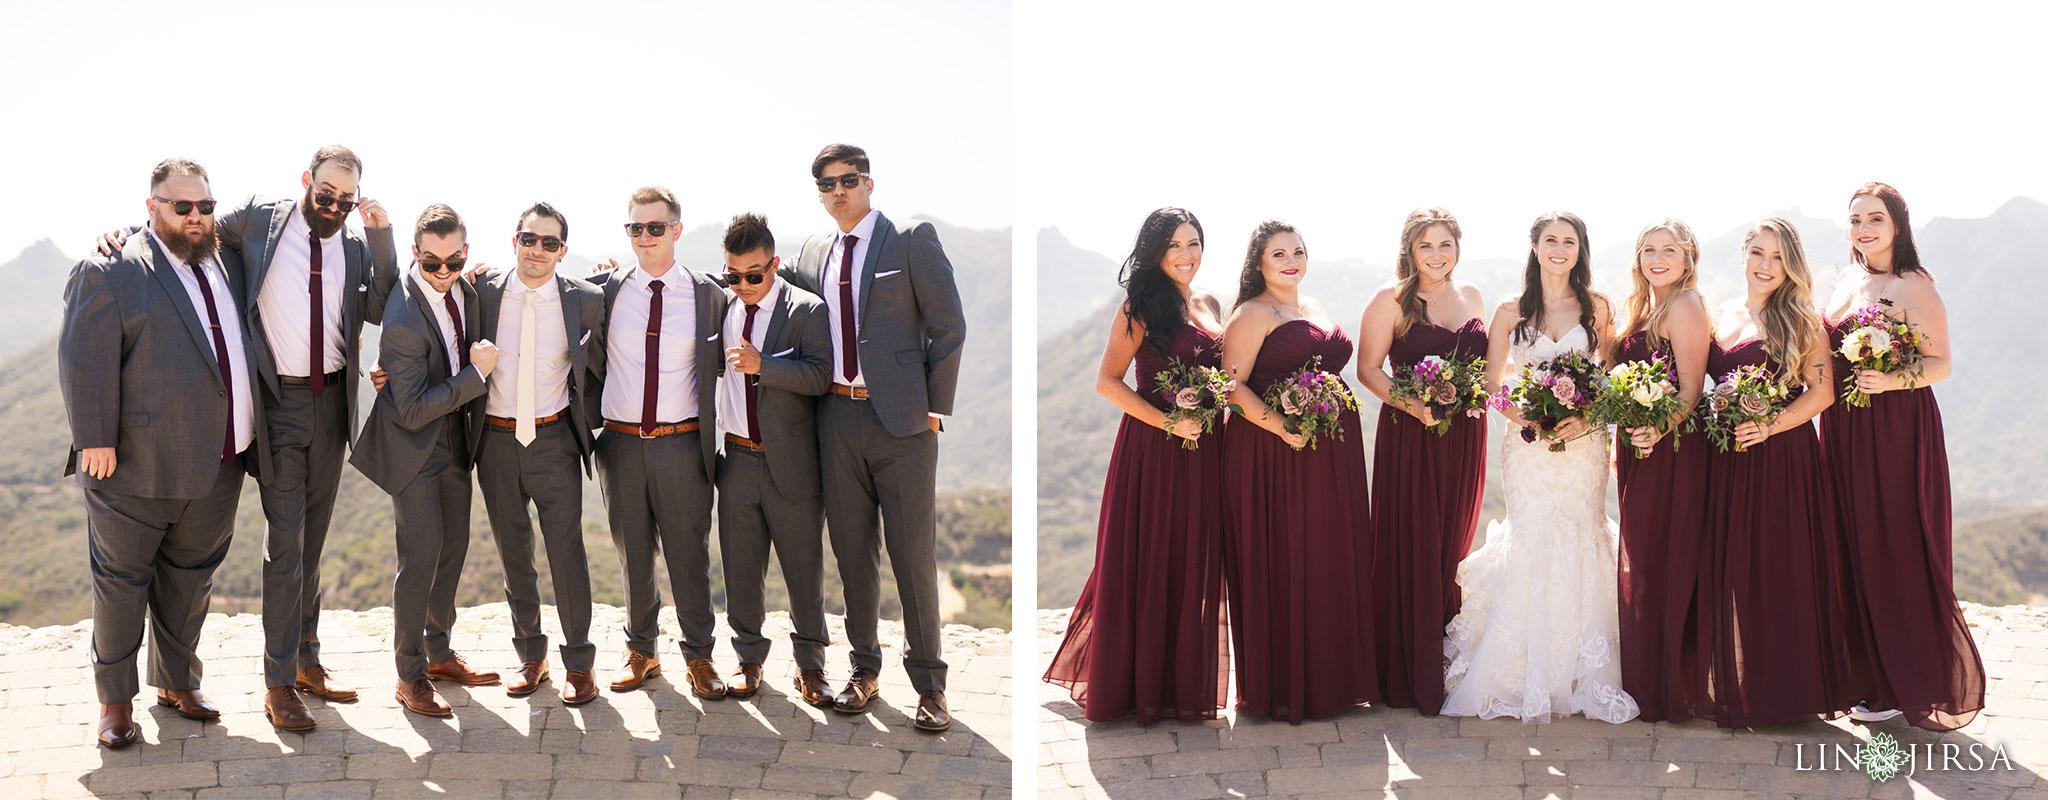 012 malibu rocky oaks wedding photography